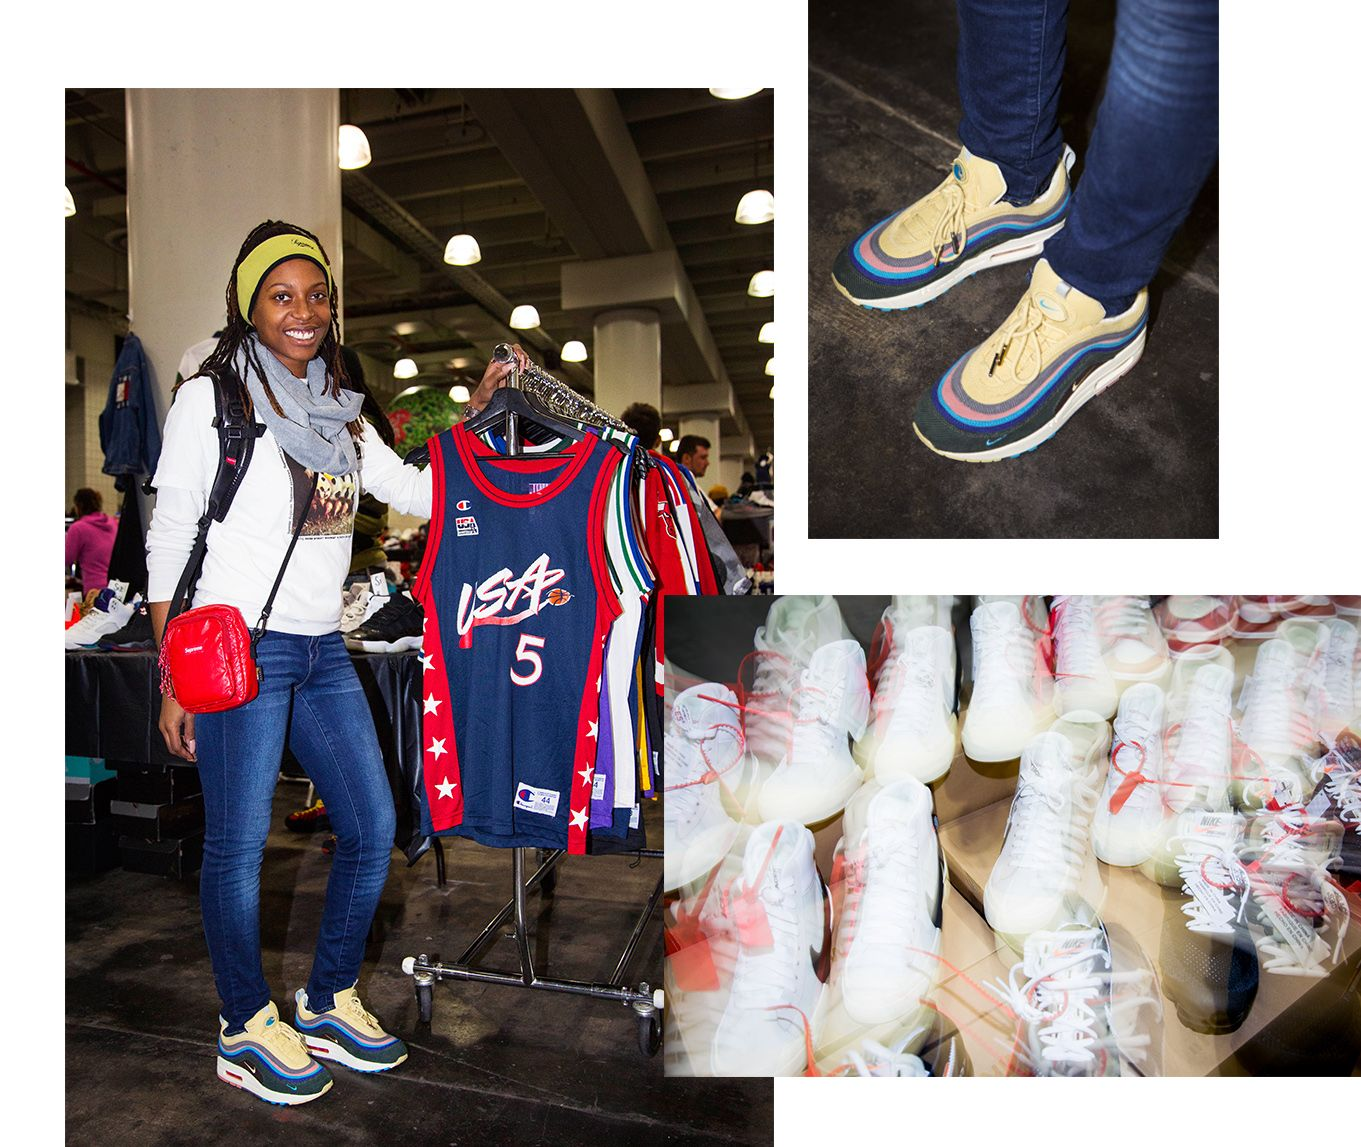 Meet 12 Women of SneakerCon- Female Sneakerheads Sound Off on Being A Woman In The Sneaker Community